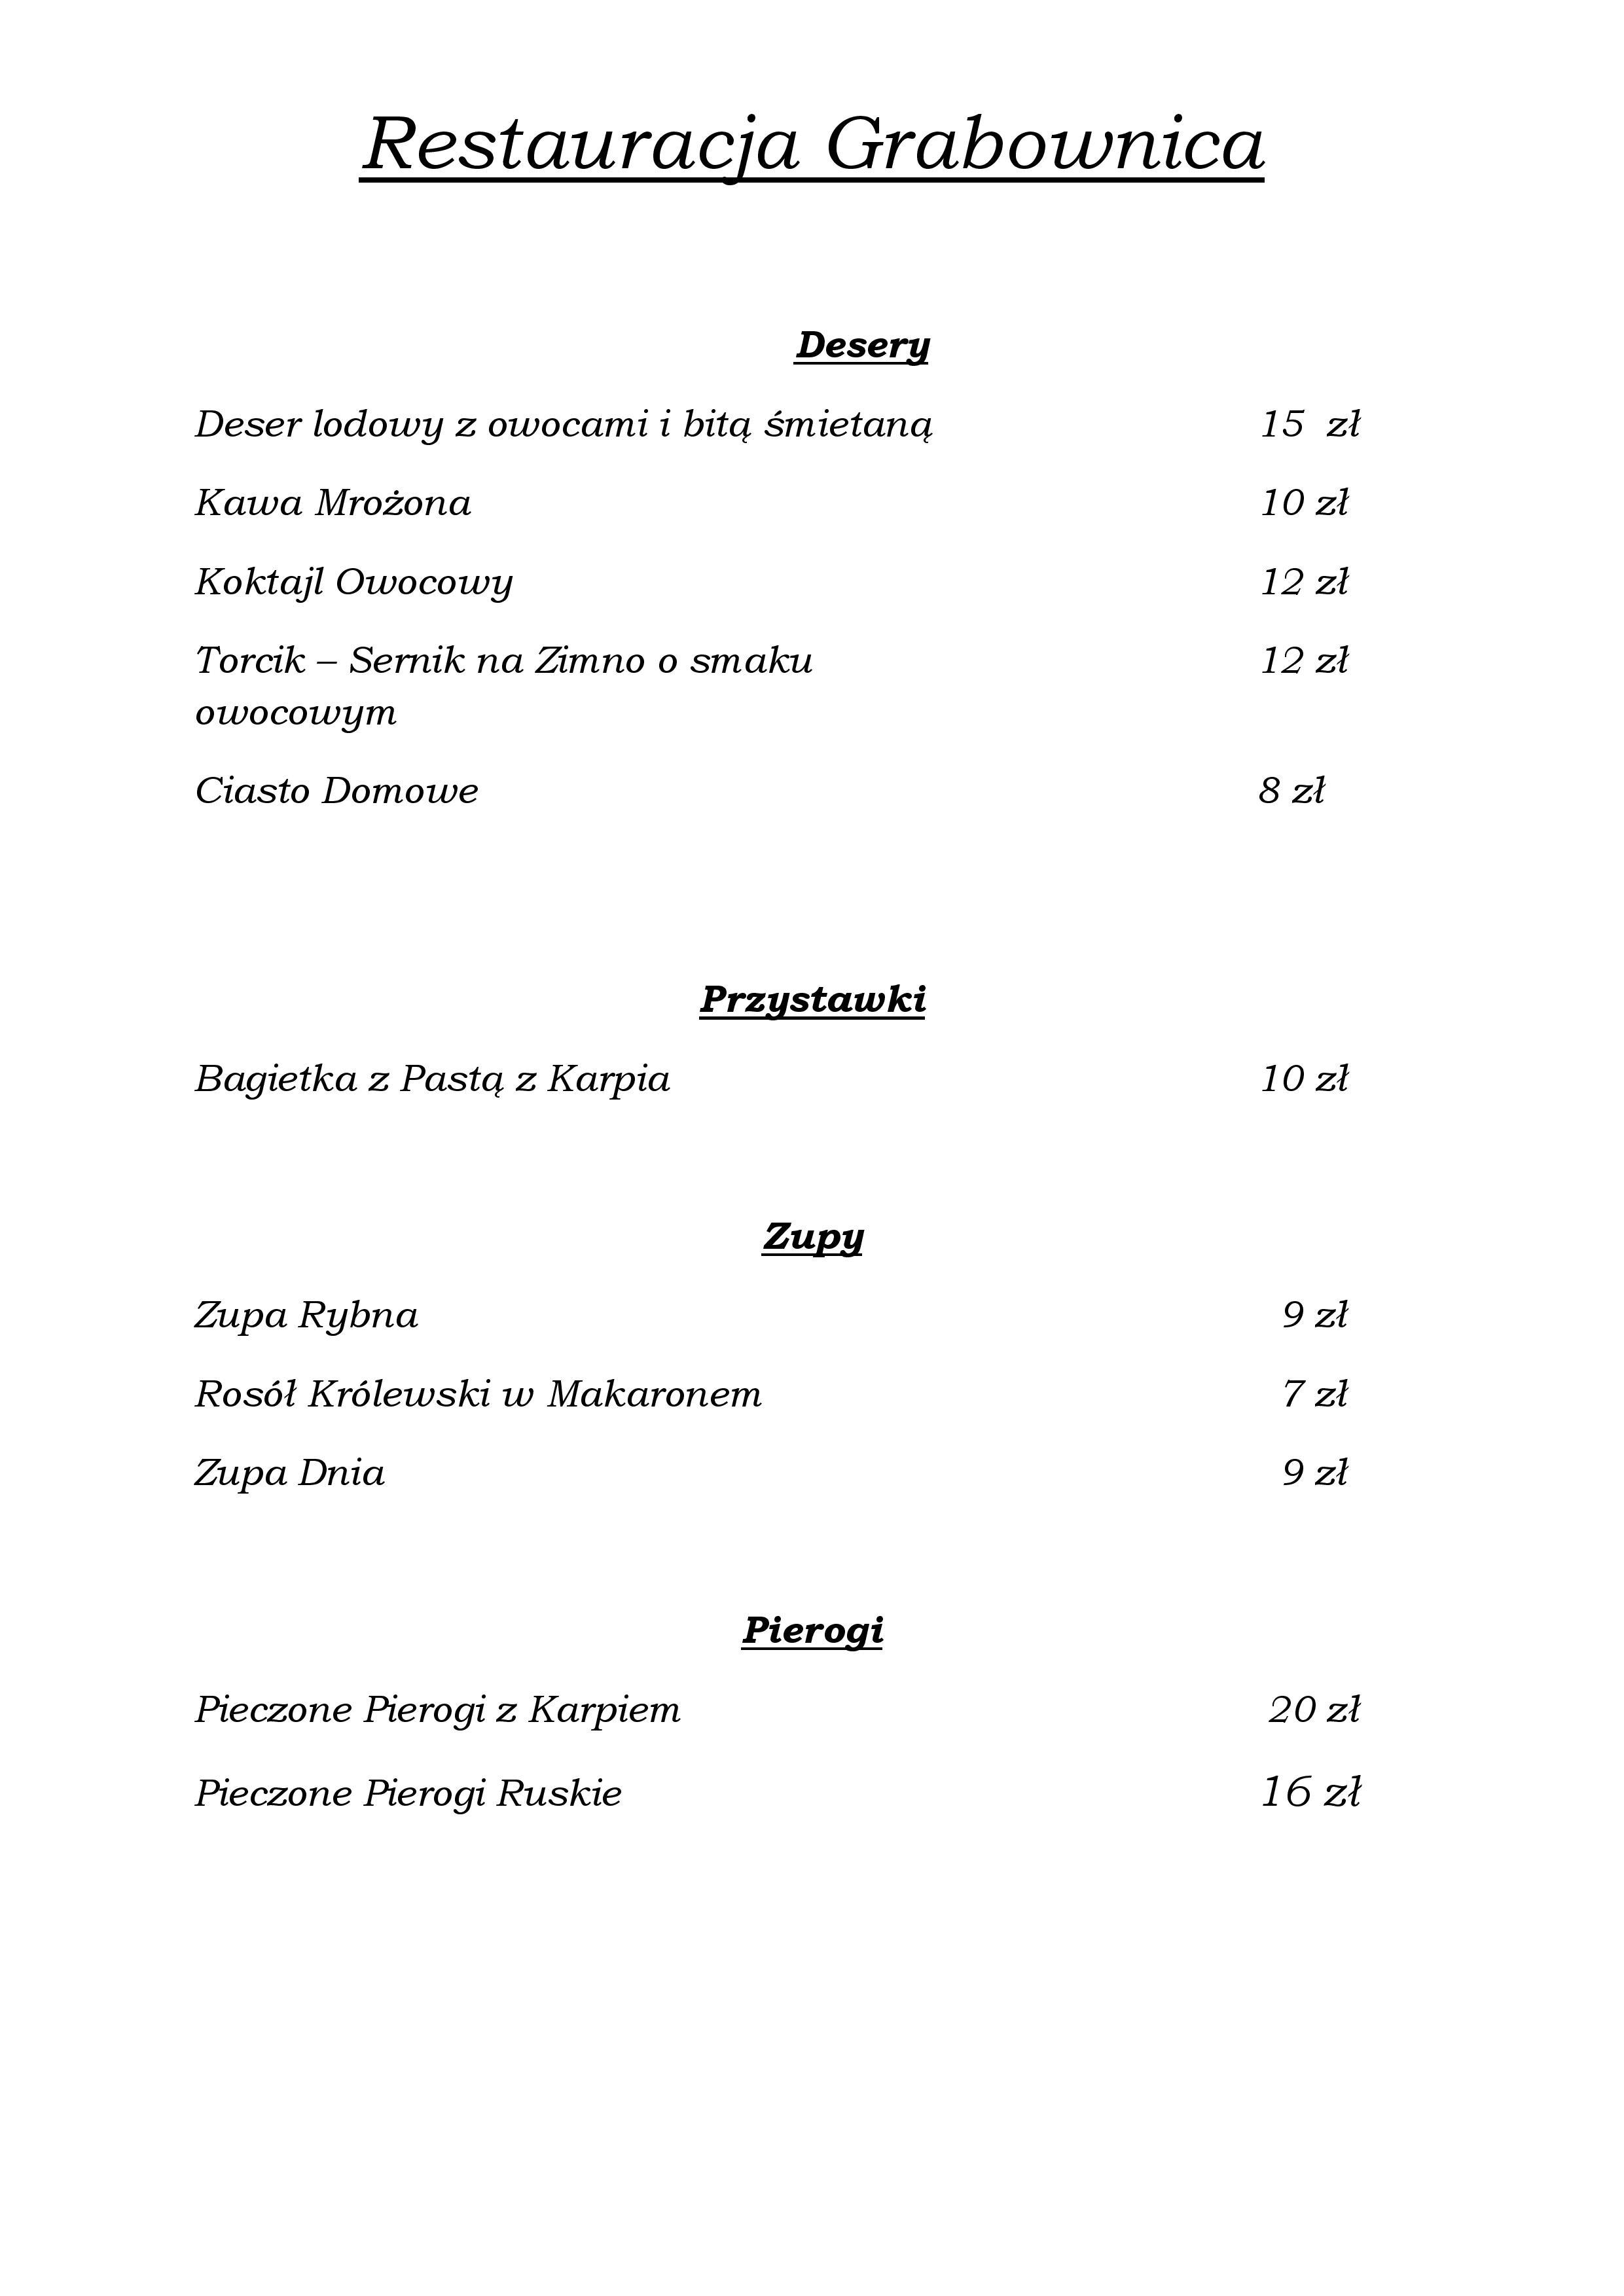 Menu RESTAURACJA GRABOWNICA MAJ 2018-page-002